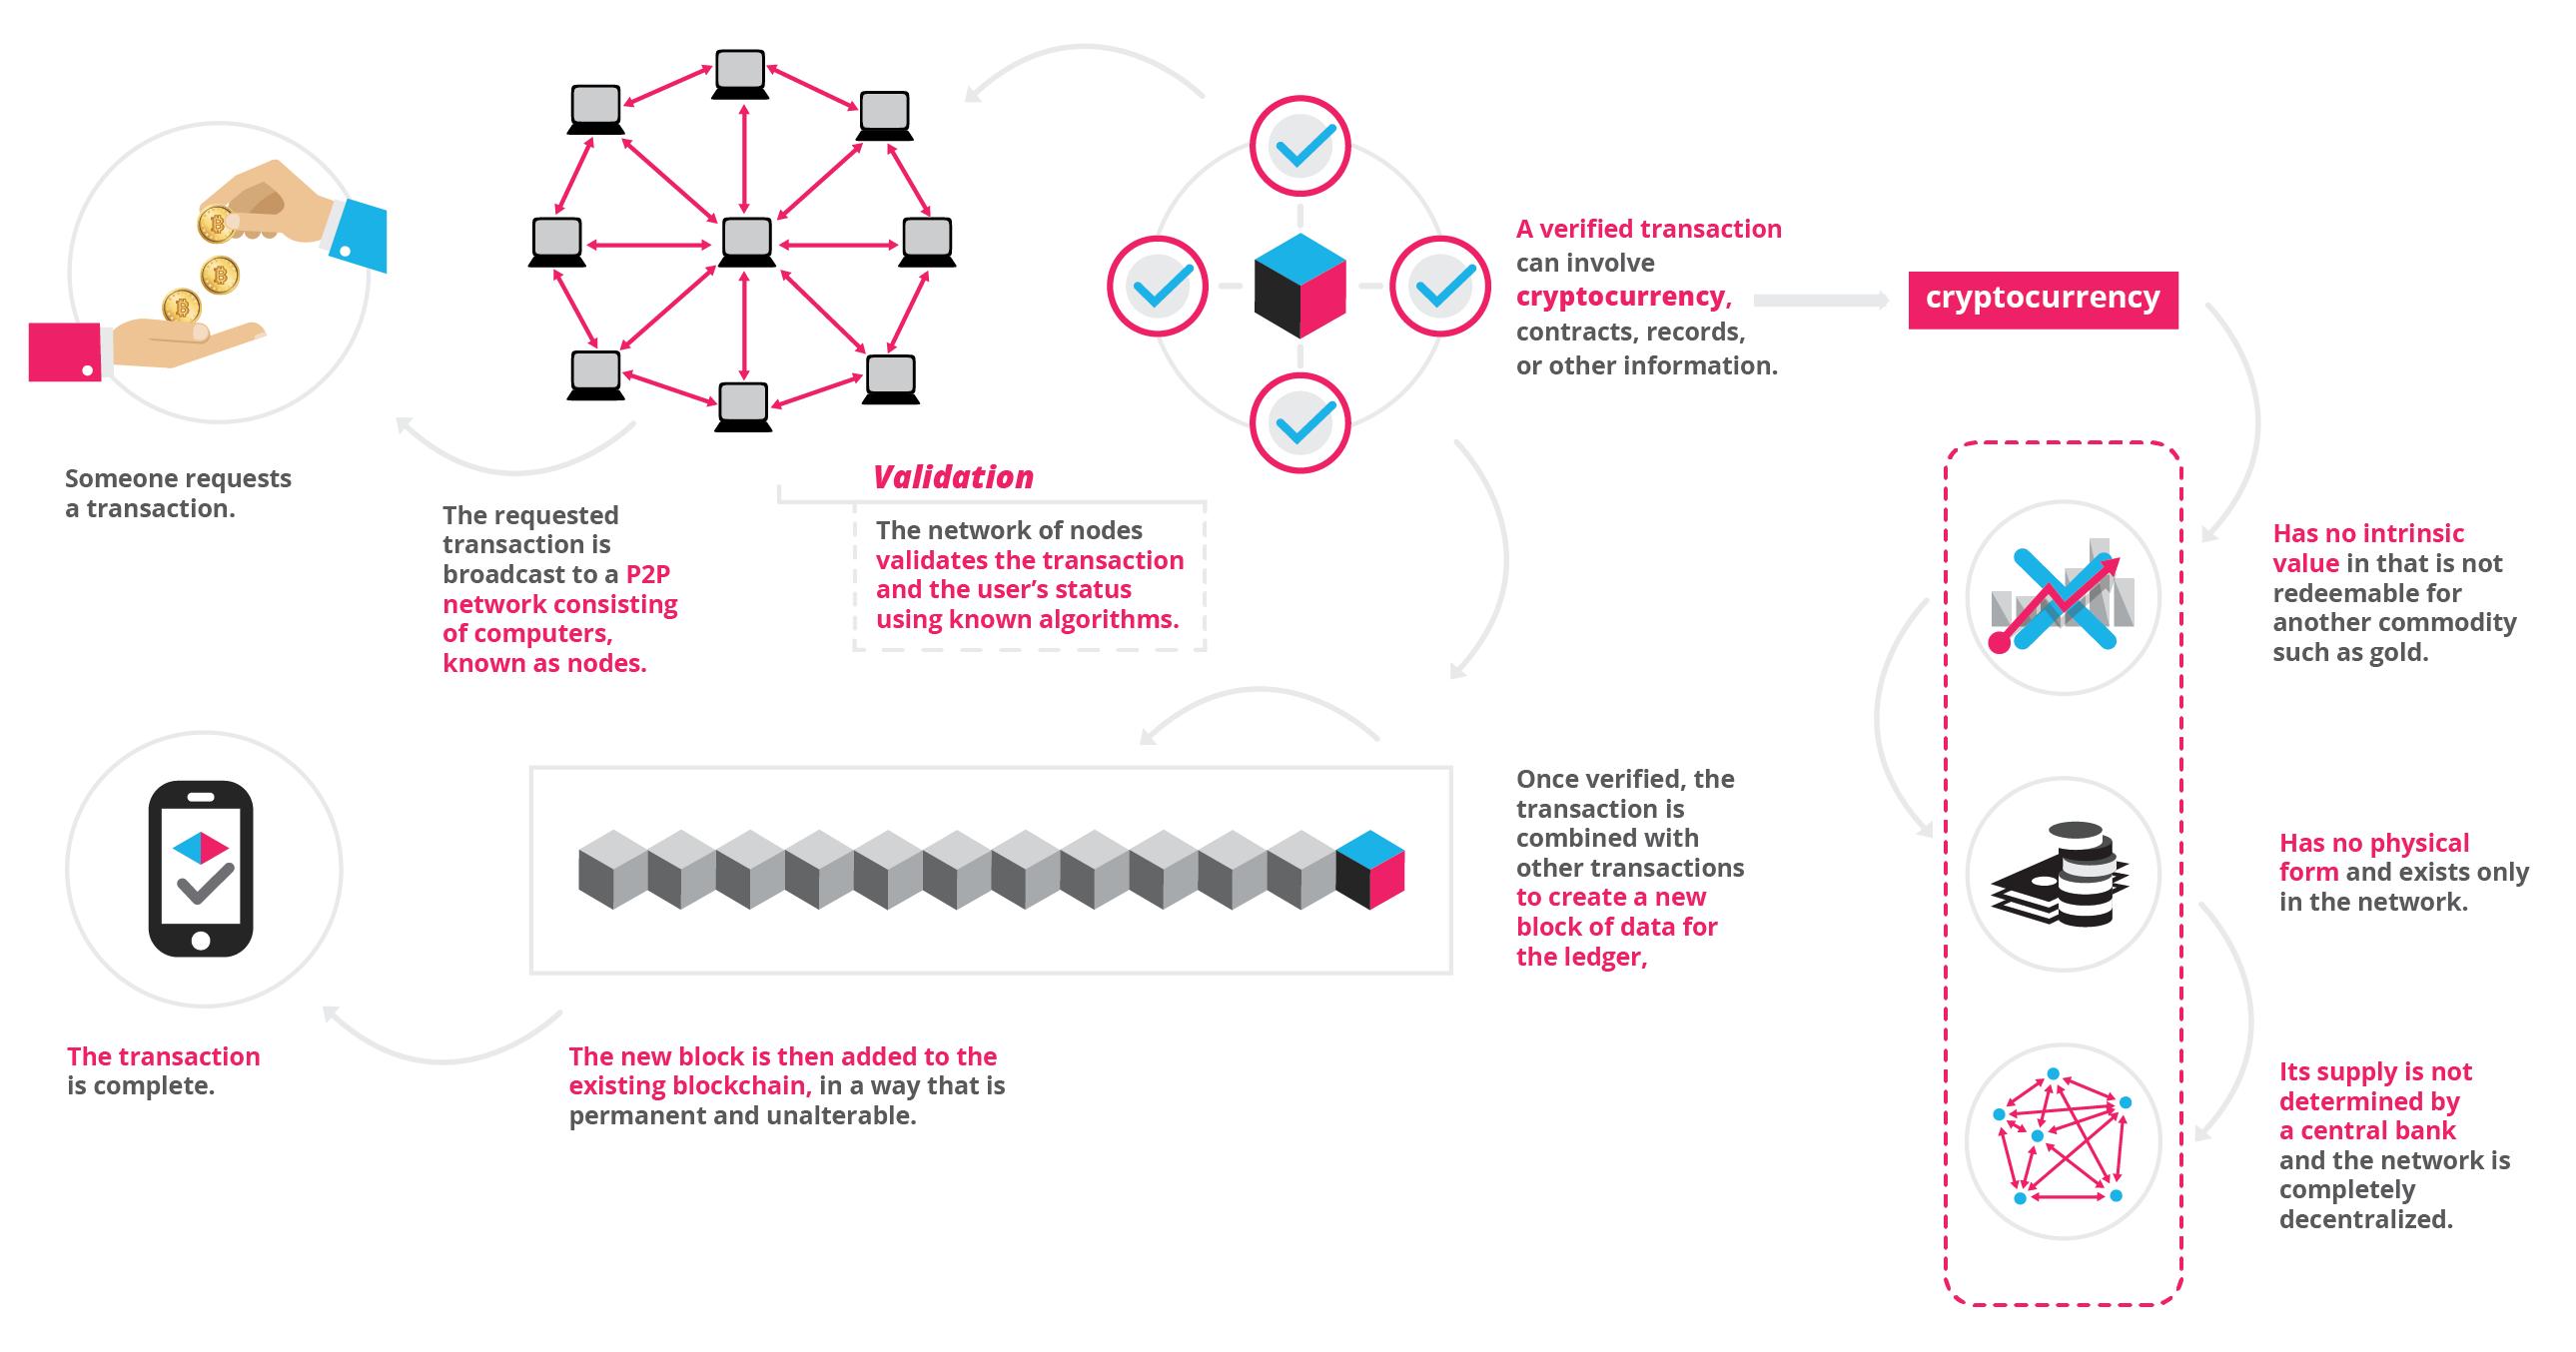 Bitcoin transaction graphic